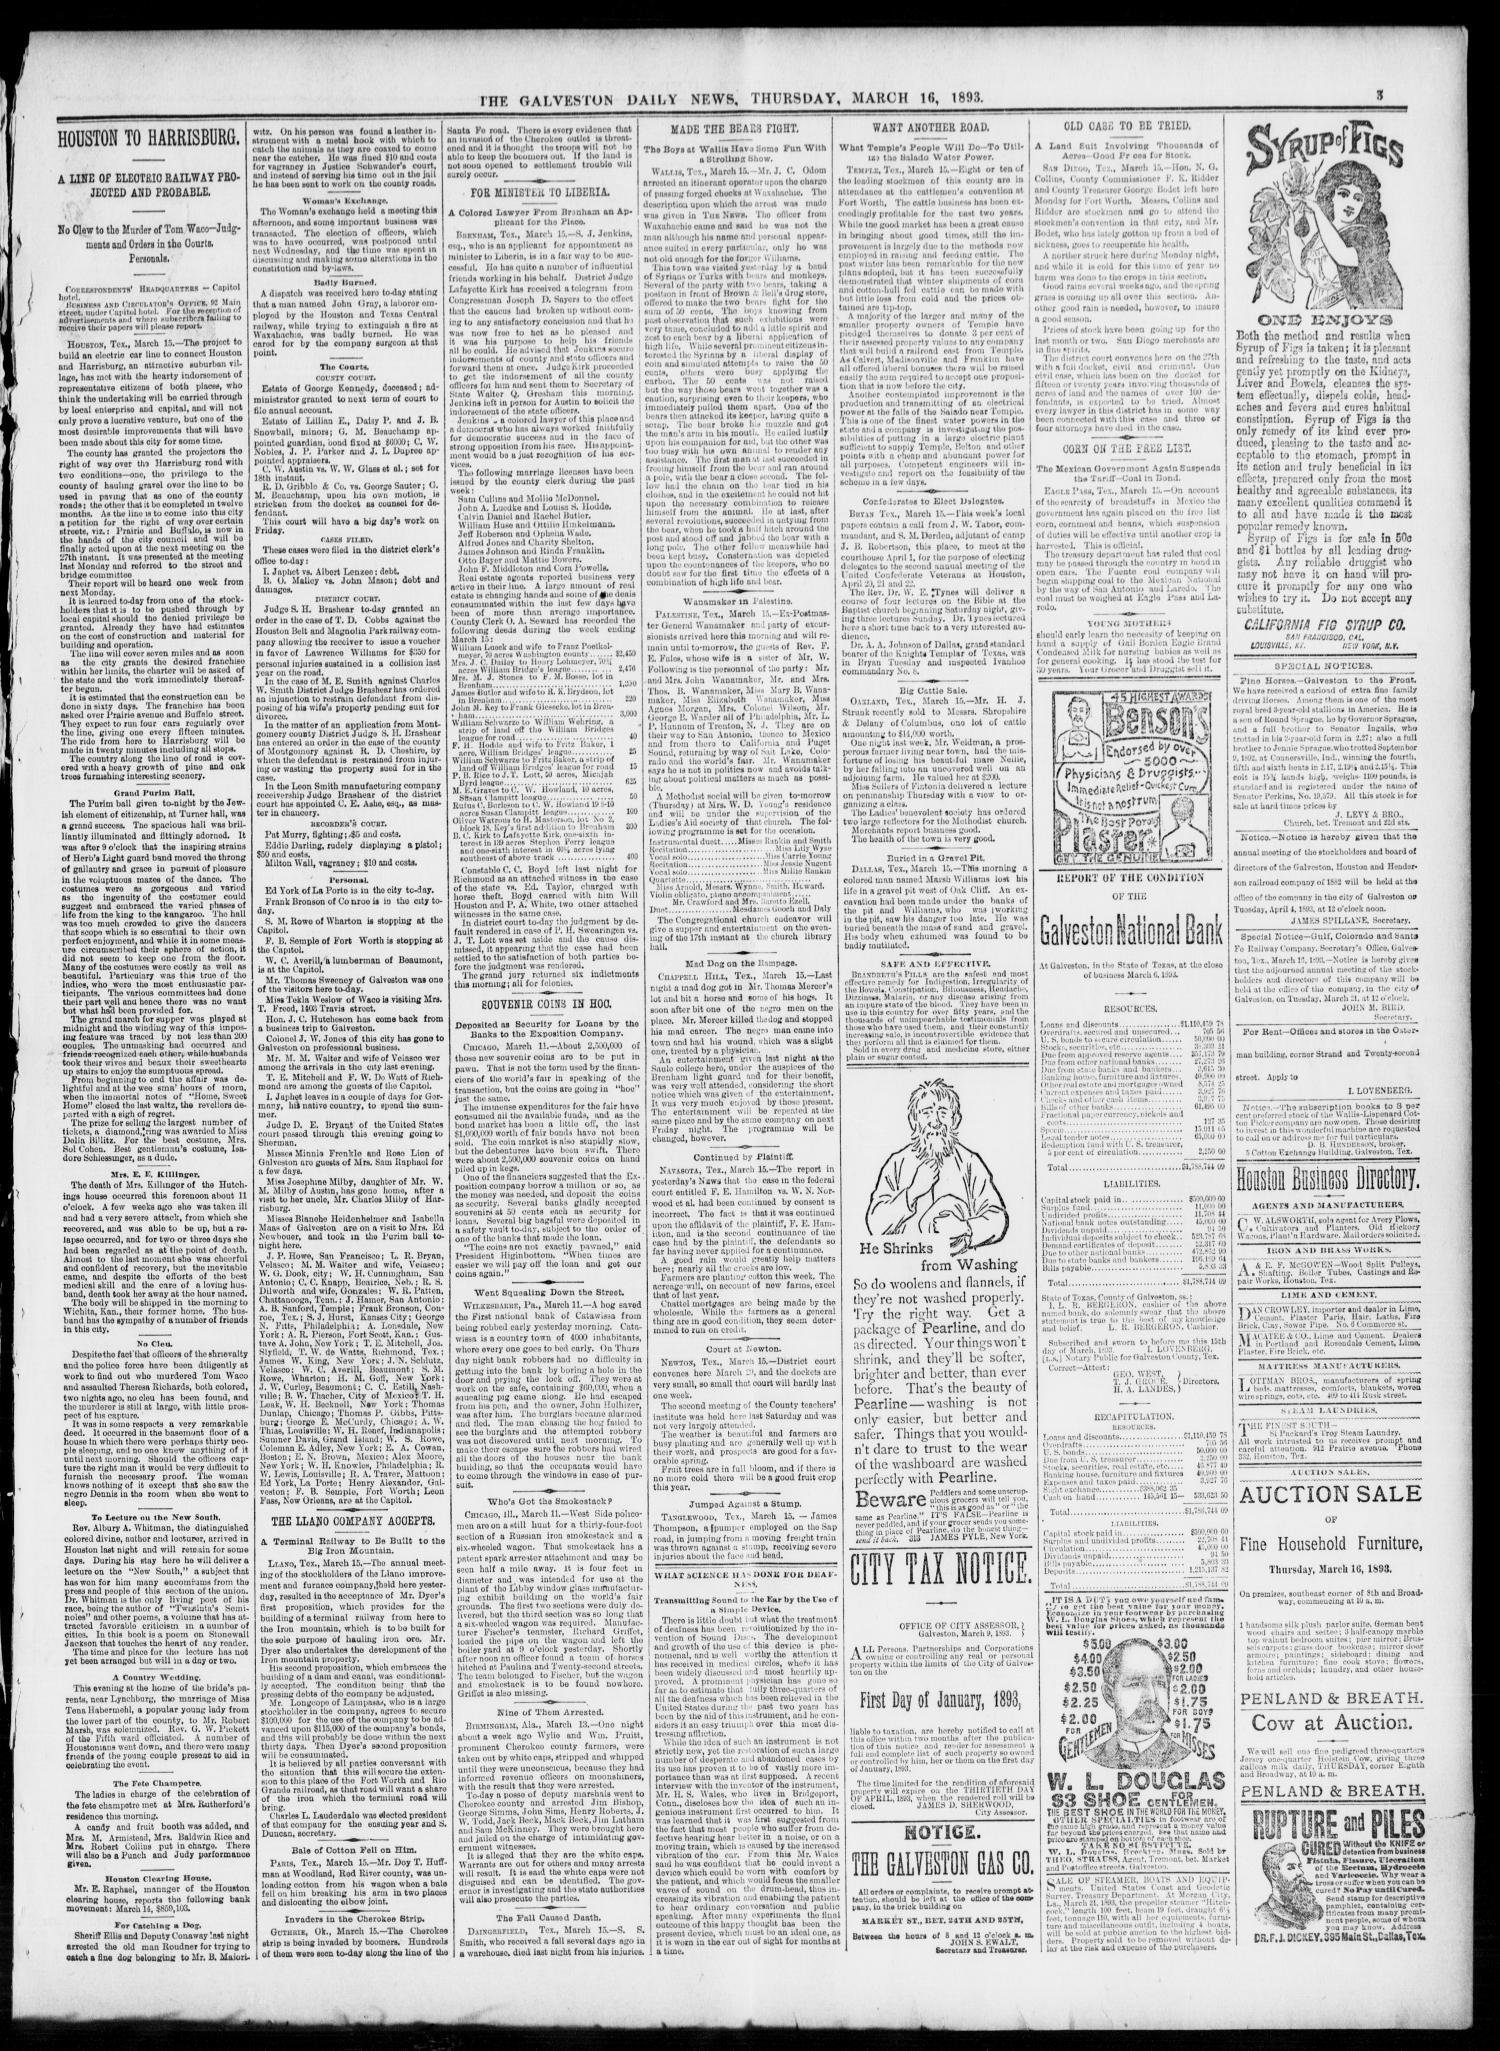 The Galveston Daily News  (Galveston, Tex ), Vol  51, No